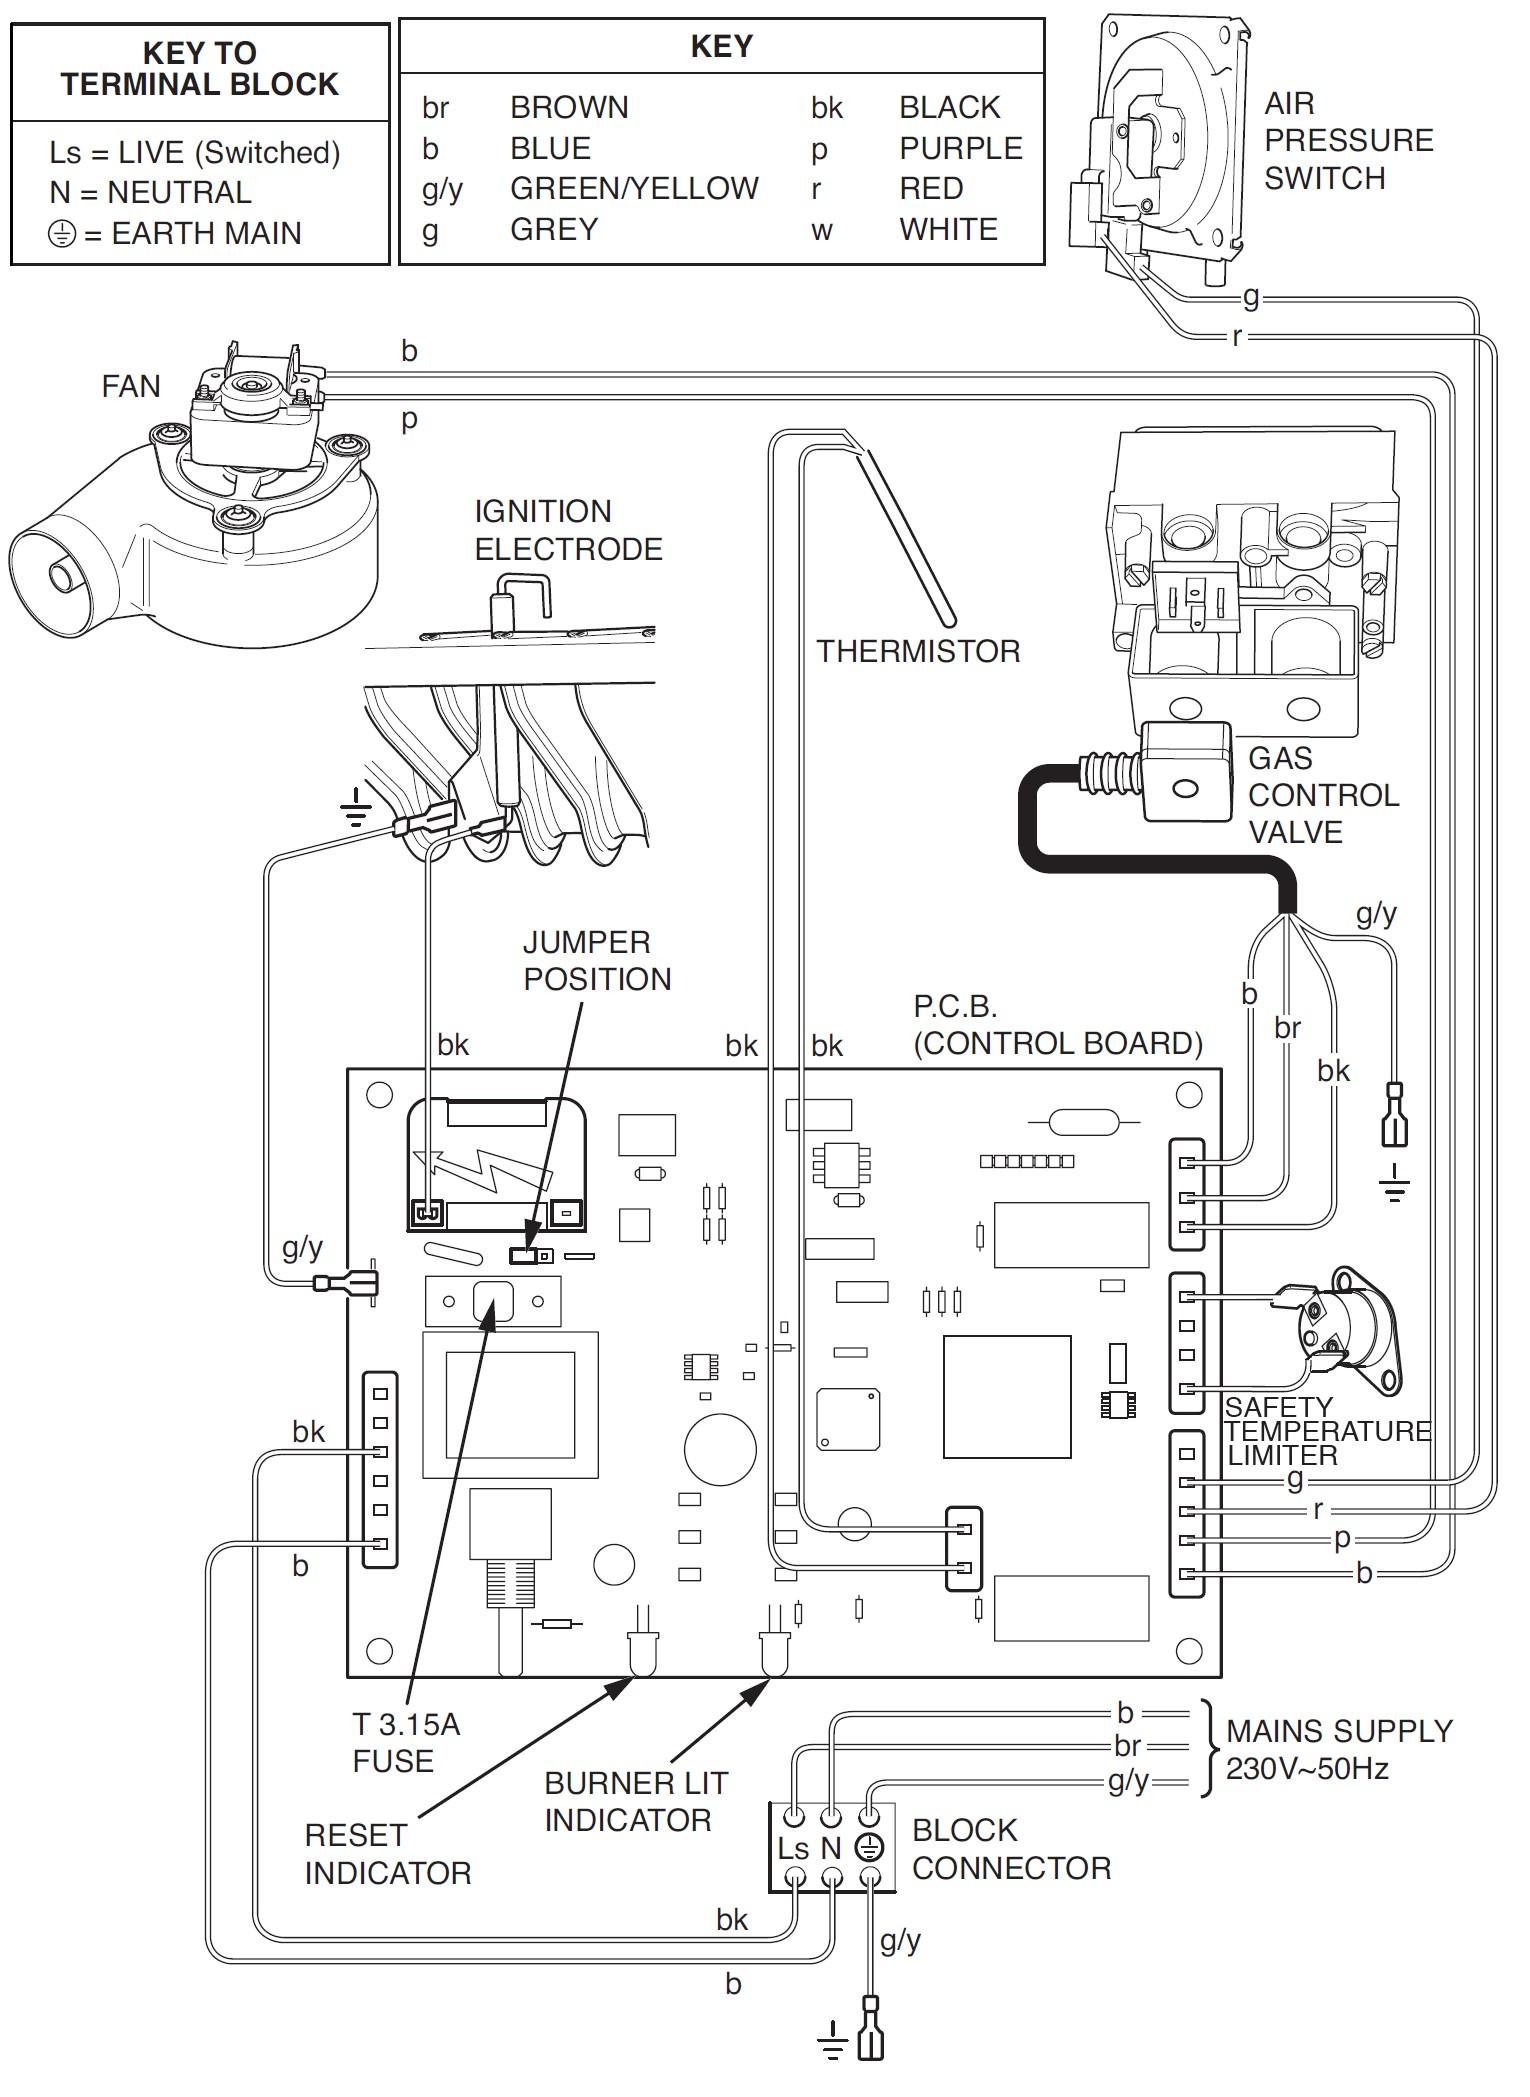 Ask Vaillant   Domestic Boilers   VaillantAsk Vaillant   Domestic Boilers   Vaillant